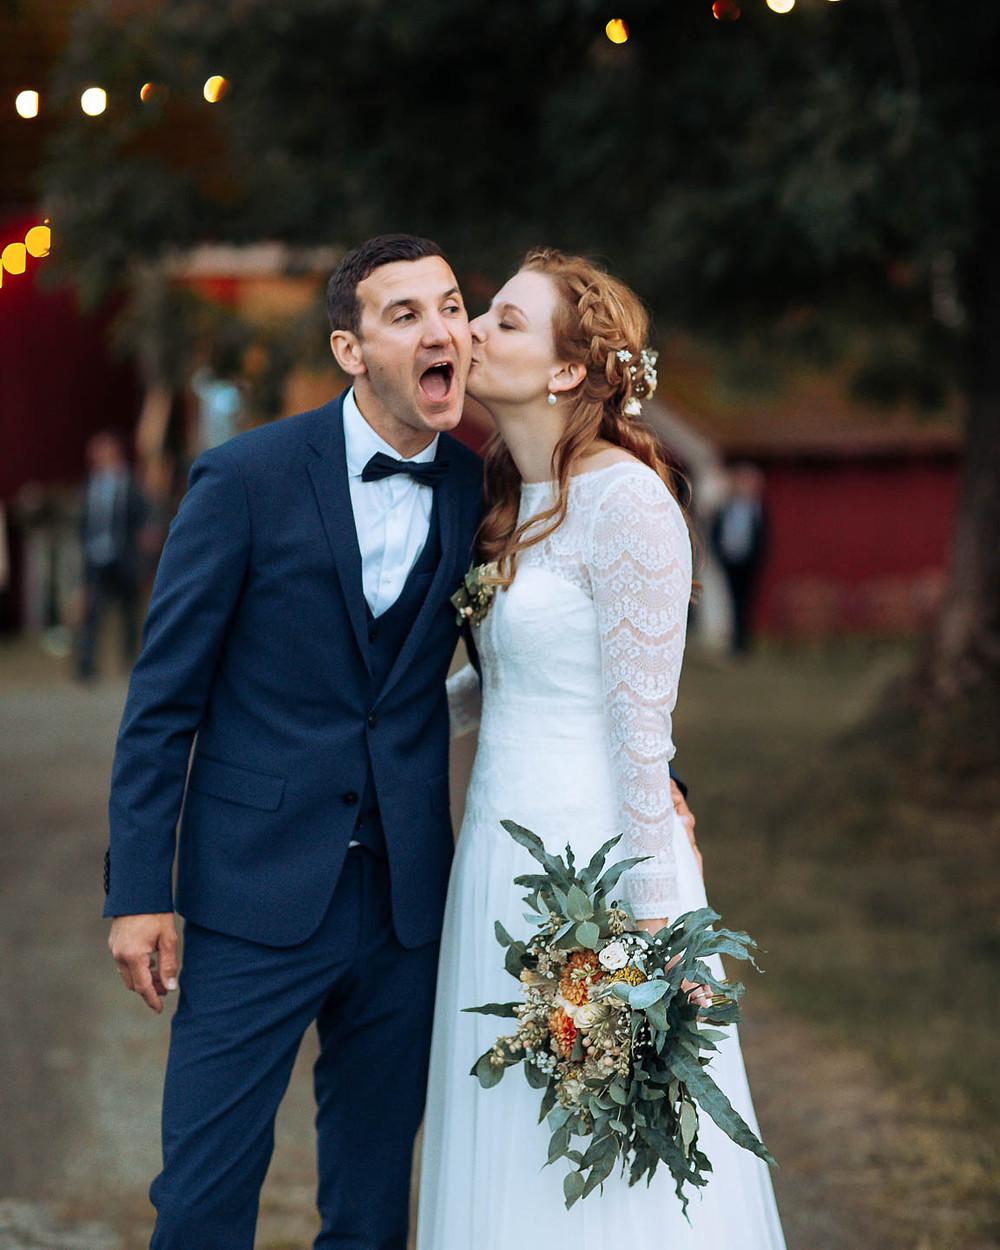 Happy kisses, wedding couple at a smal farm wedding